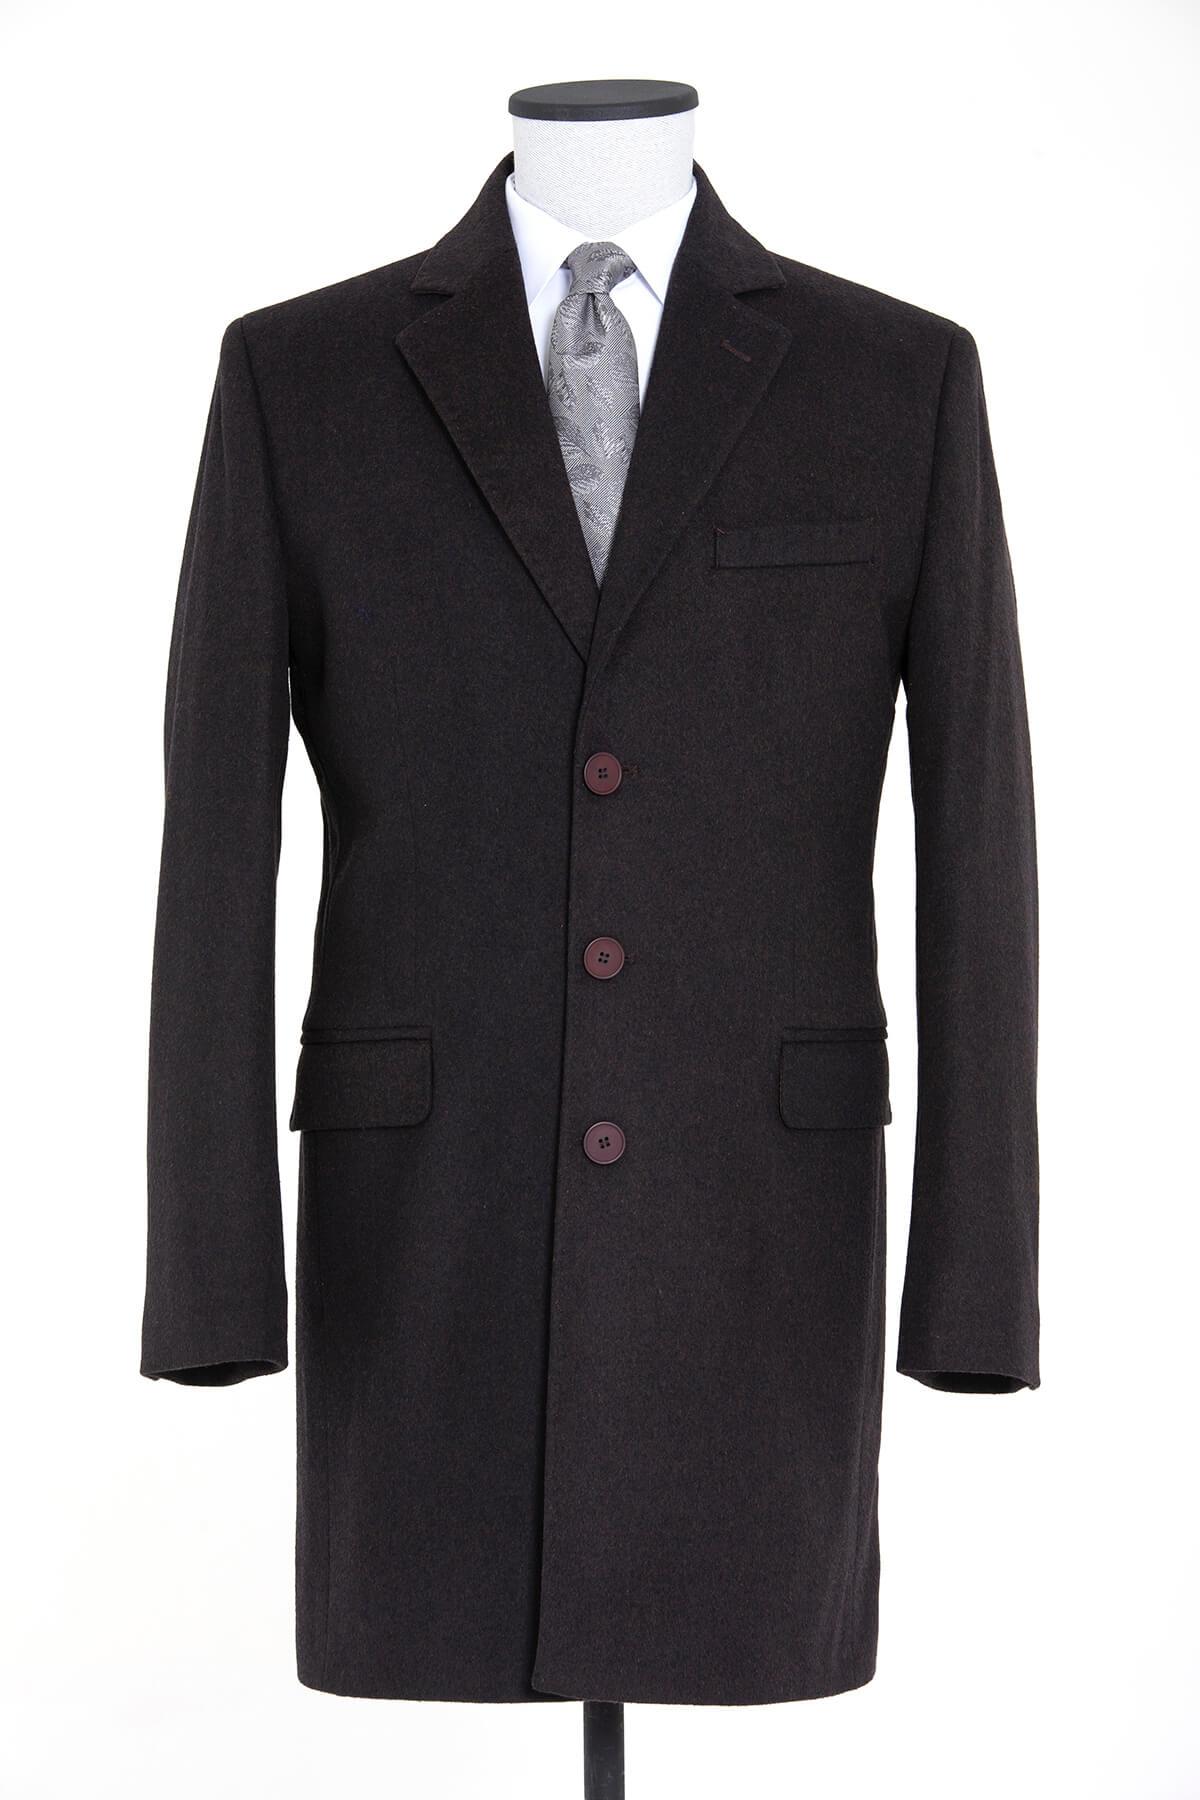 Kahveregi Ceket Yaka Yünlü Palto - Thumbnail